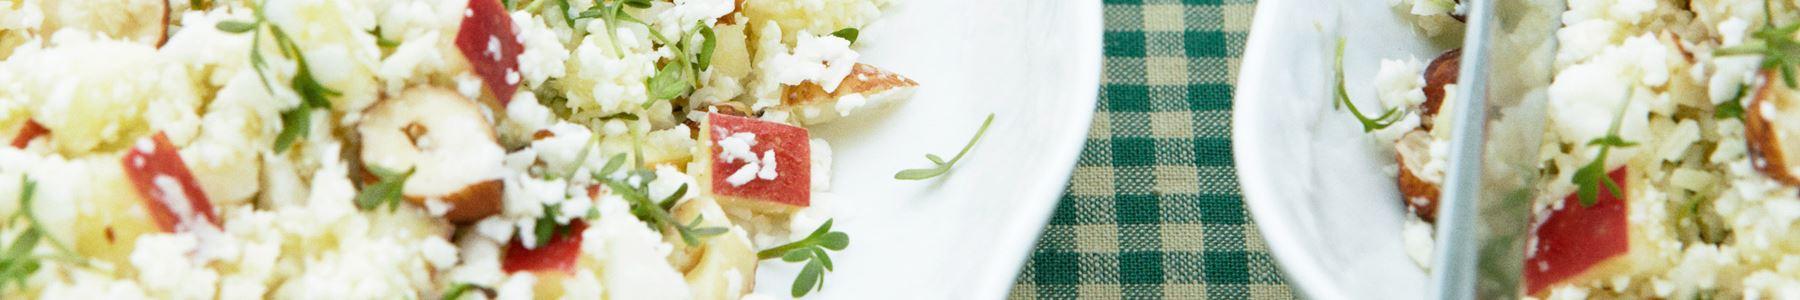 Hurtig + Salater + Frokost + Efterår